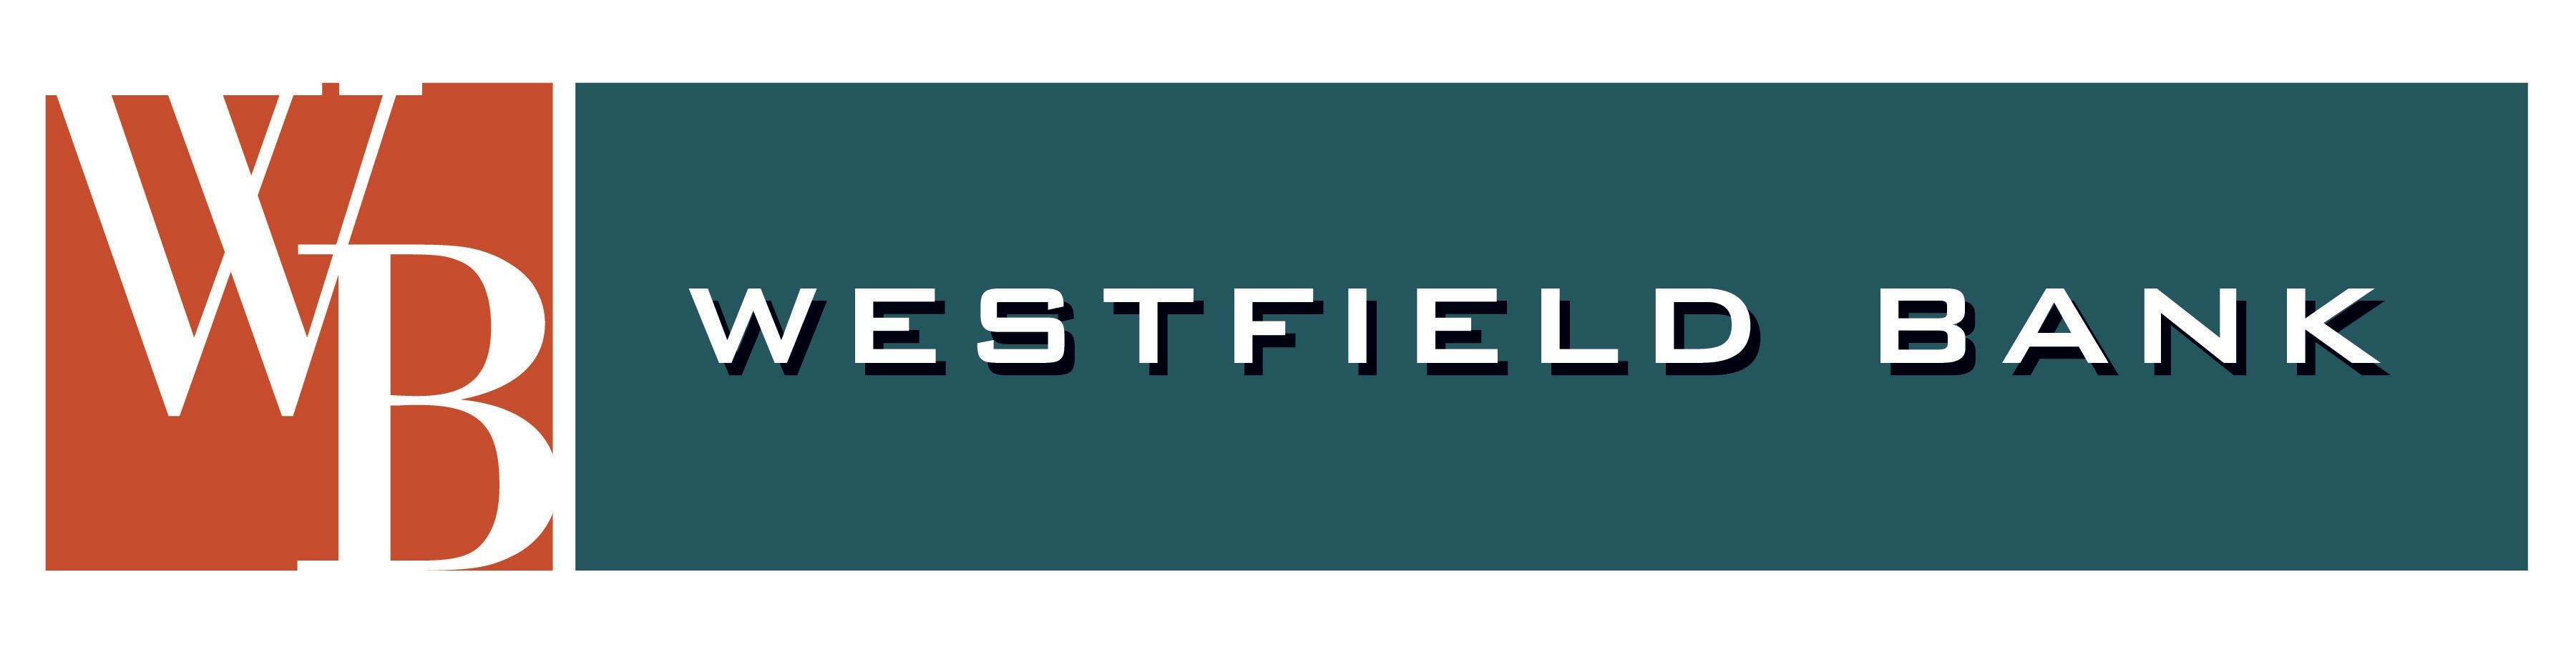 SBA Names Westfield Bank Top Western Massachusetts 3rd Party Lender ...